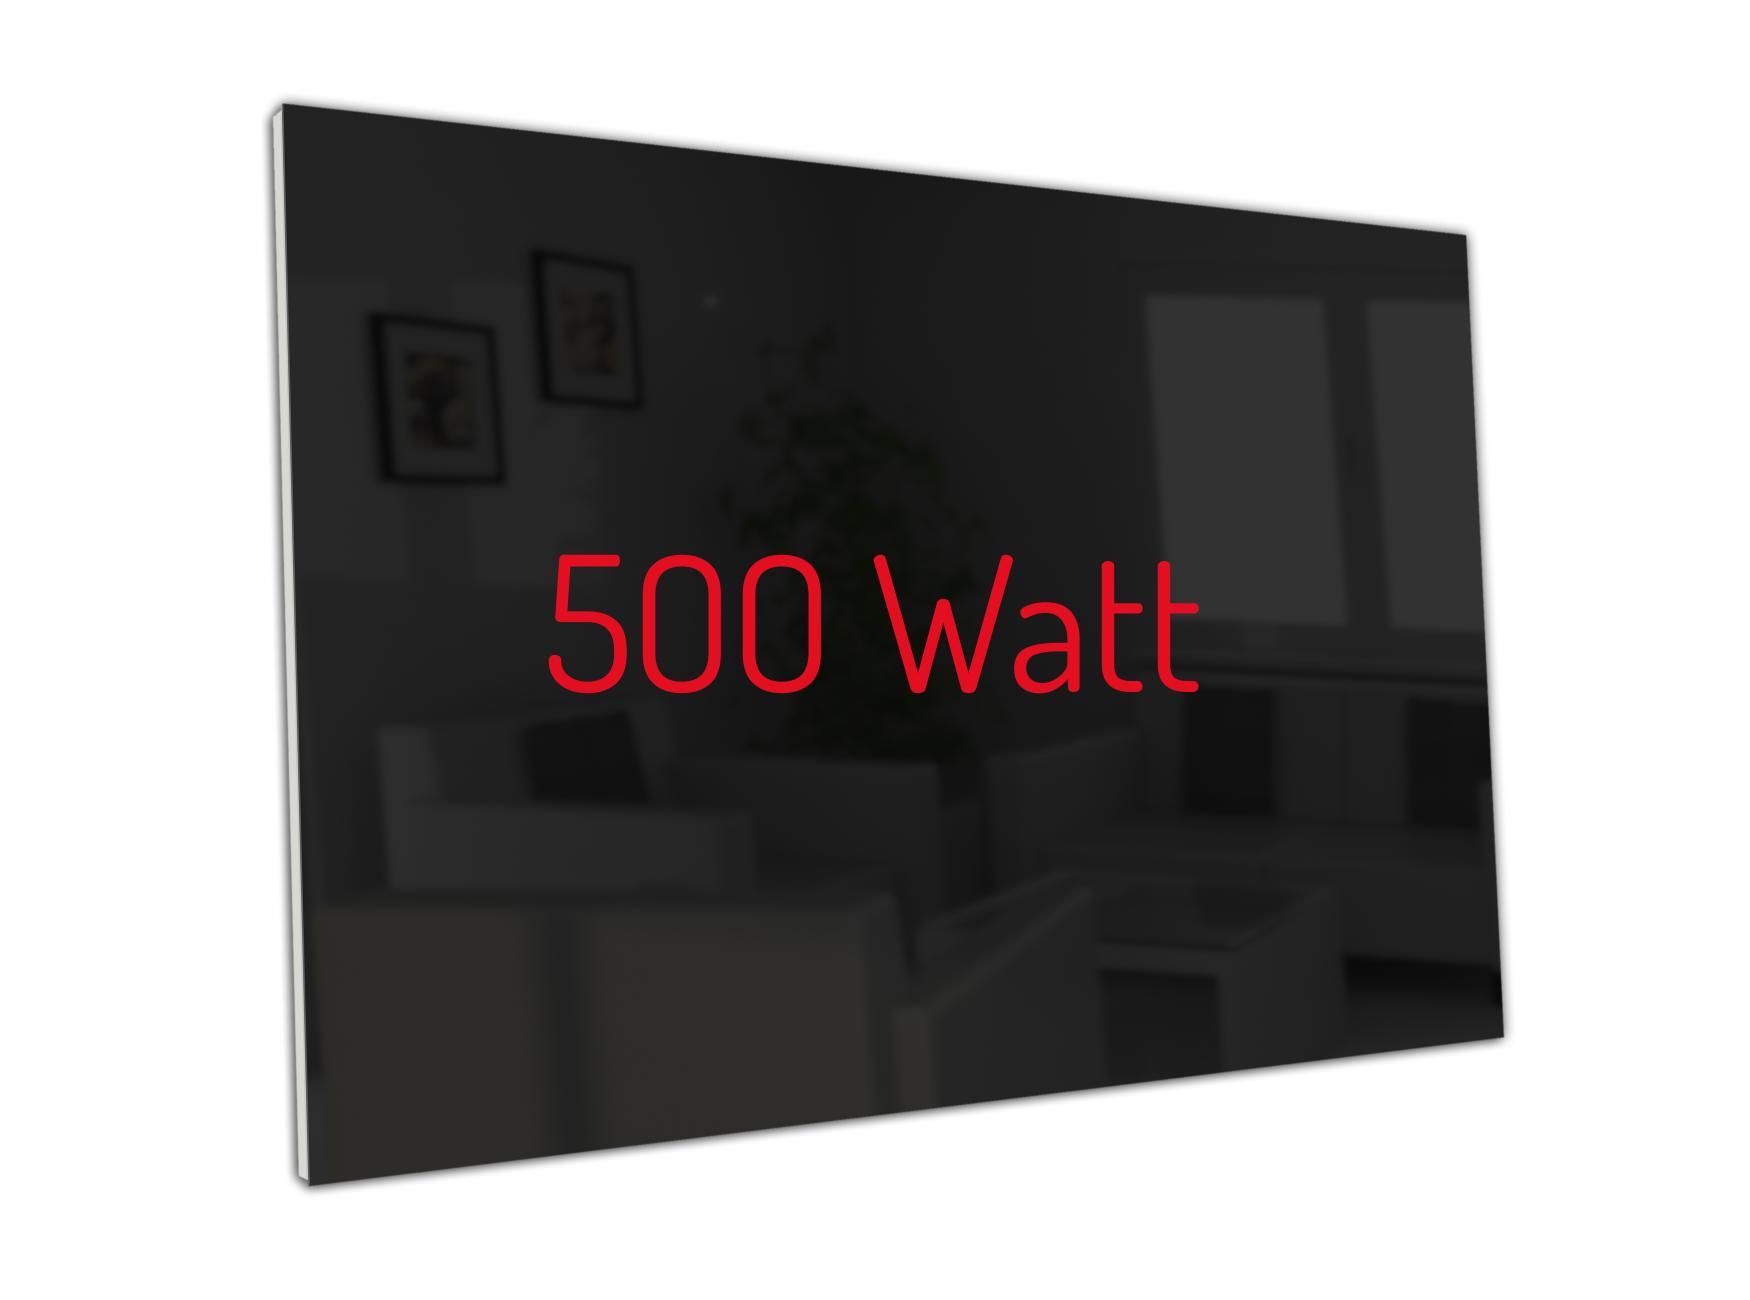 PowerSun Carboglas schwarz 500 Watt 60x90cm